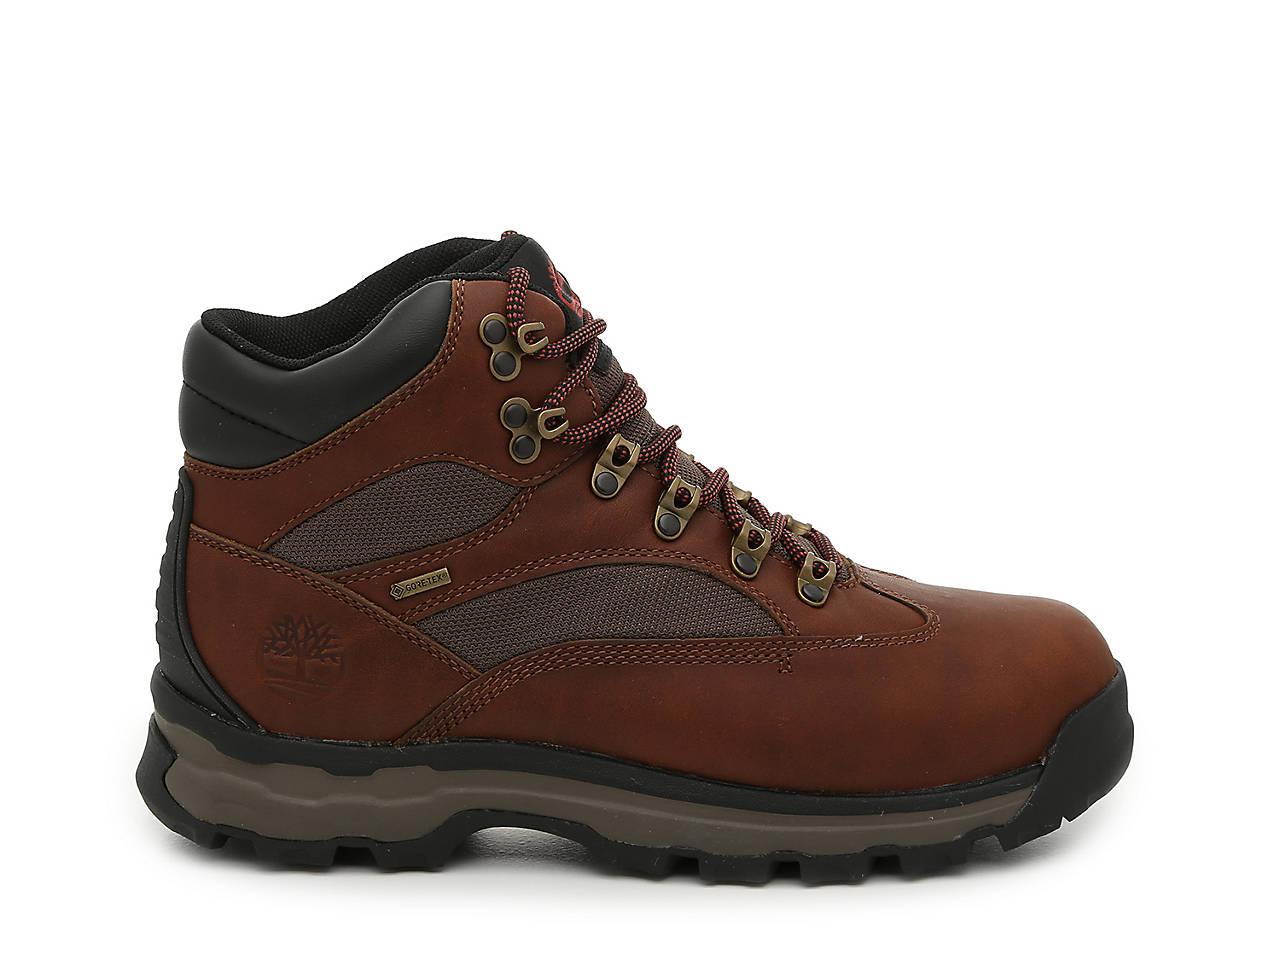 96ca9c28a7a Chocorua Trail 2.0 Hiking Boot